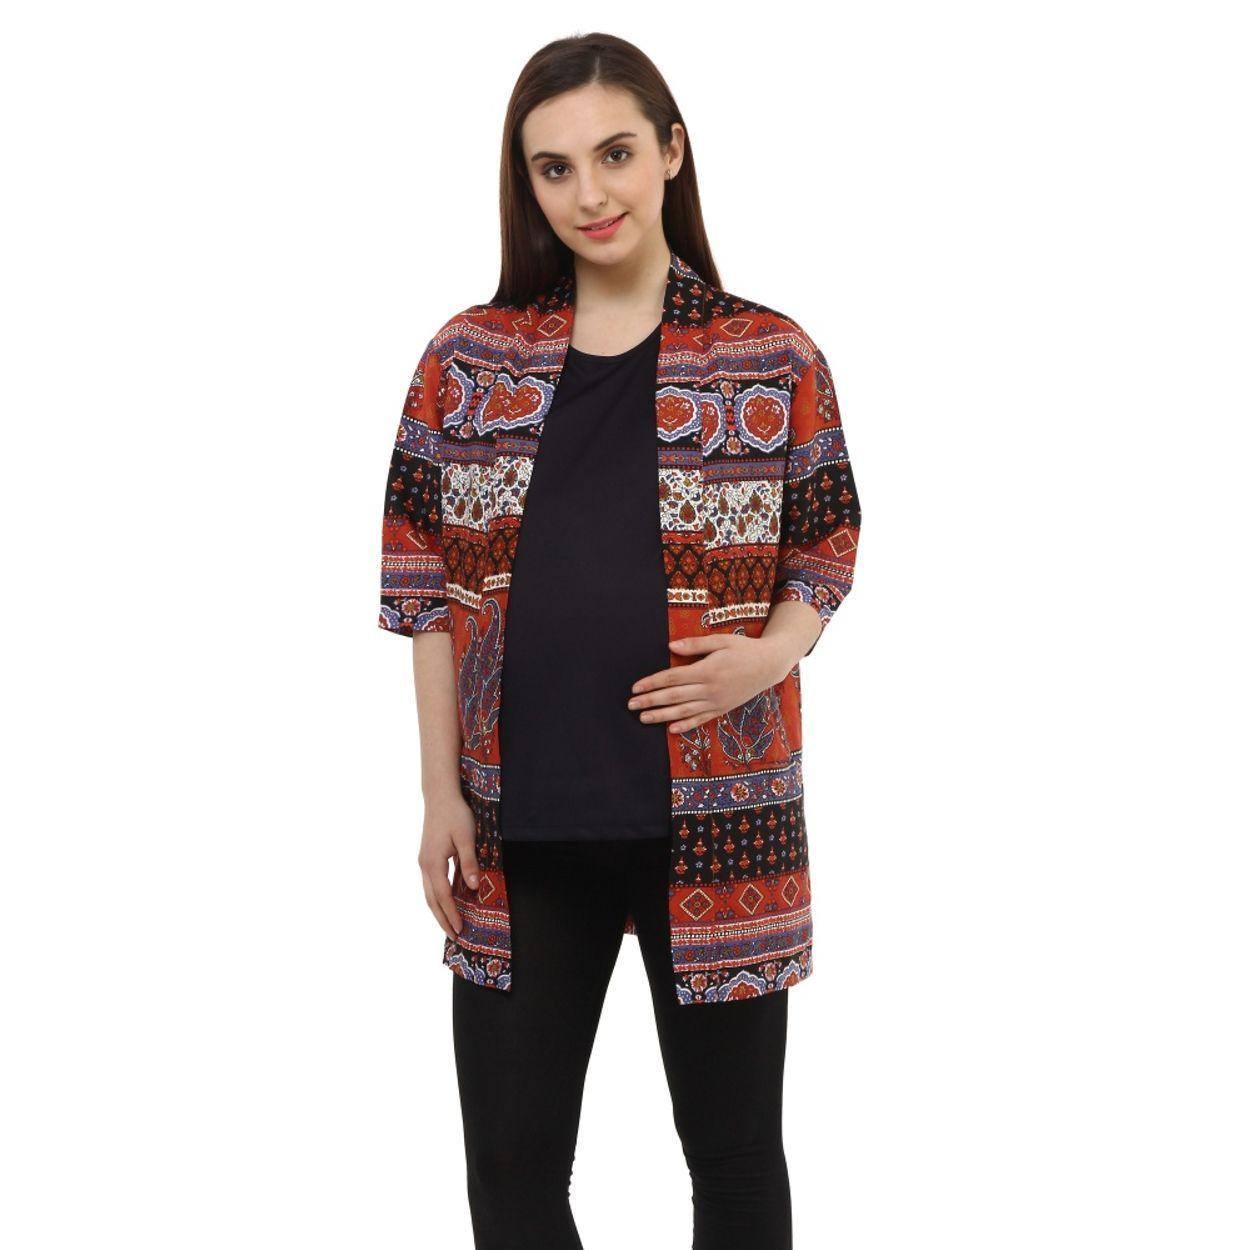 cdba9037541 Maternity Dresses Buy Online India - Gomes Weine AG